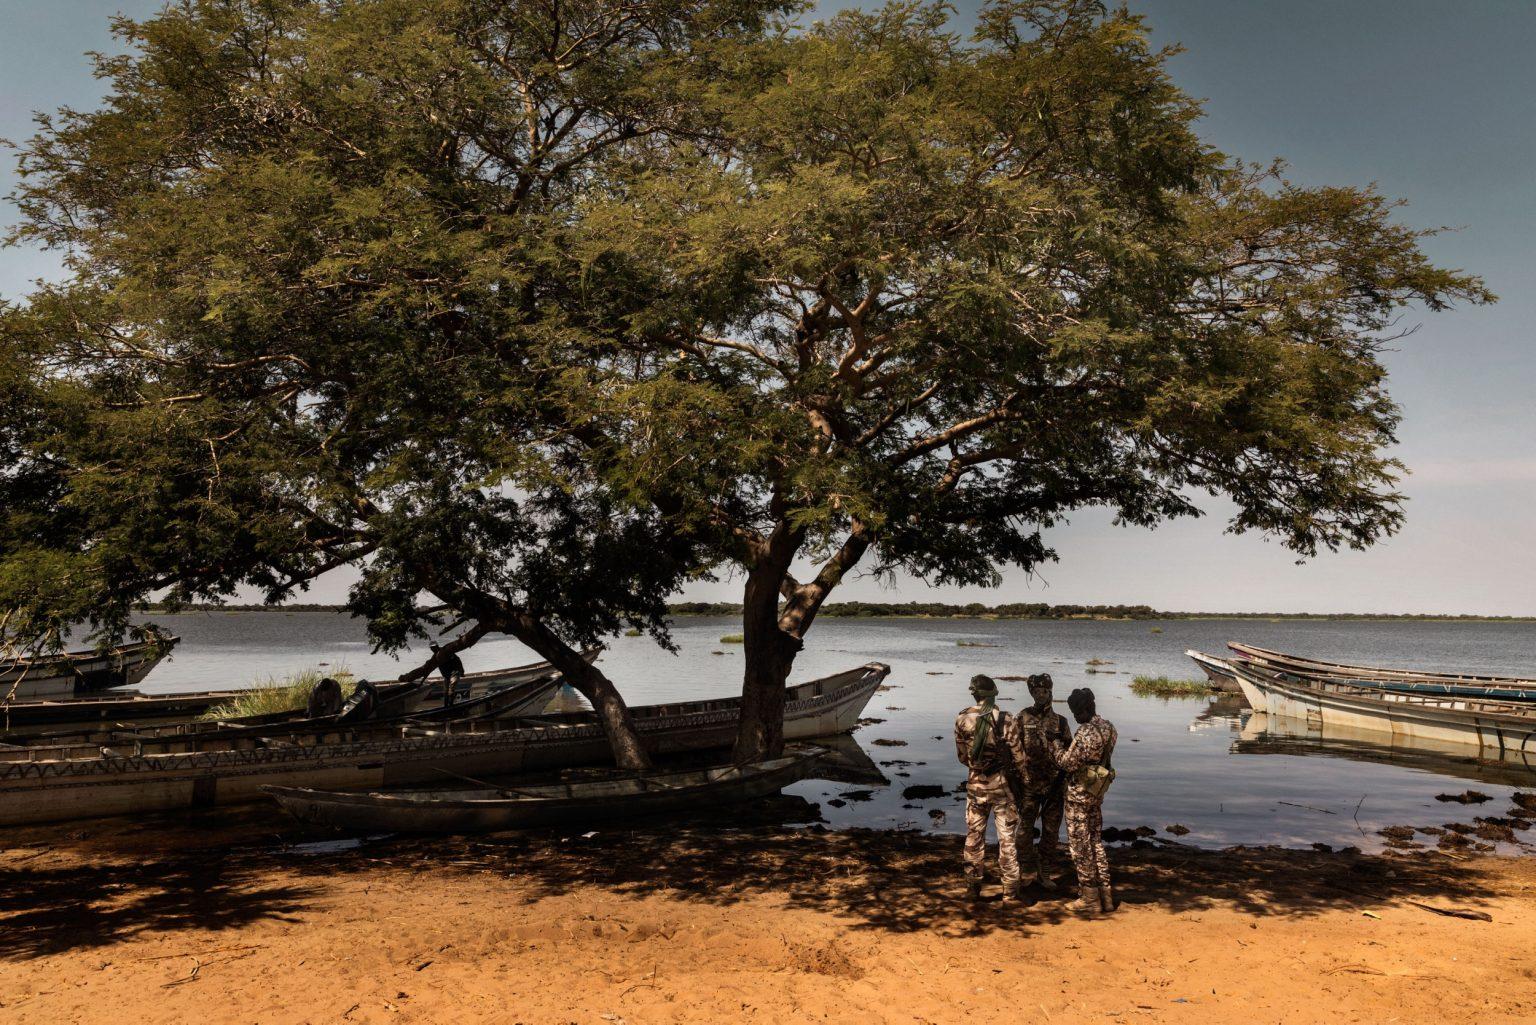 Africa, Chad, Bol, October 2018 - The Chadian army is involved in a number of anti-terrorism missions throughout the Sahel. The ANT is a very active presence in the Lake Chad basin and the islands, where Boko Haram?s men are hiding. >< Africa, Ciad, Bol, Ottobre 2018 - L'armata del Ciad è coinvolta in diverse missioni anti-terrorismo nel Sahel. L'ANT è una presenza attiva nel bacino del Lago Ciad e nelle isole, dove si nascondono gli uomini di Boko Haram. *** SPECIAL   FEE   APPLIES *** *** Local Caption *** 01362912